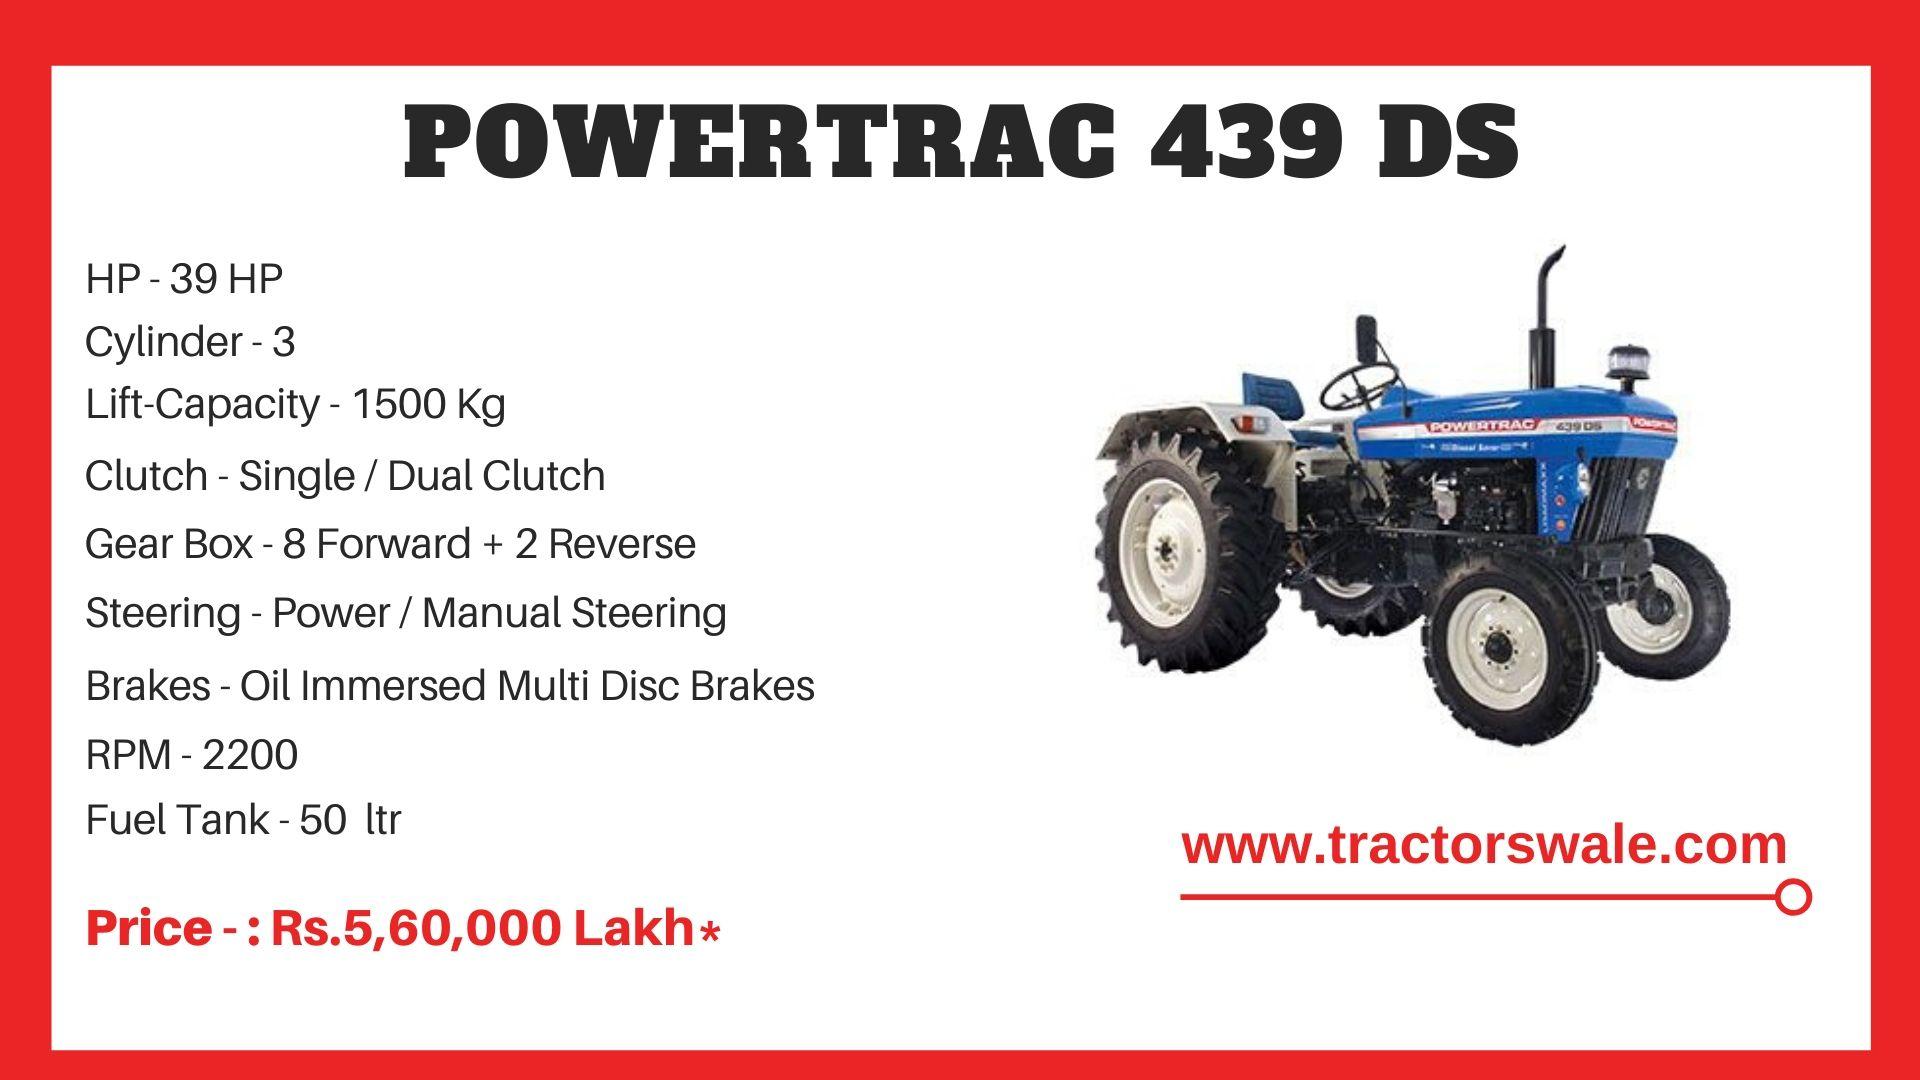 PowerTrac 439 DS Tractor Price